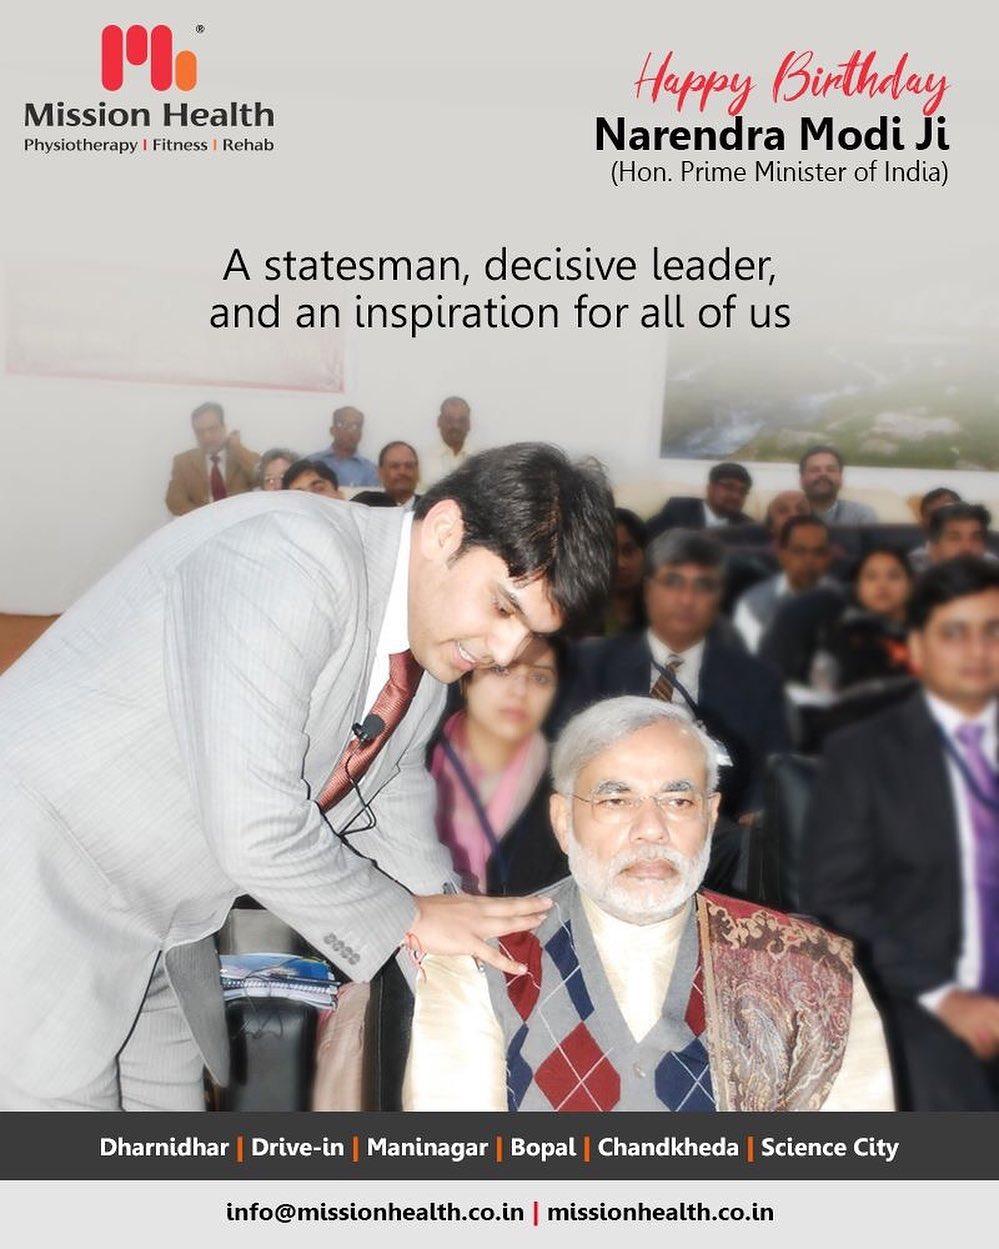 A statesman, decisive leader, and an inspiration for all of us.  #HappyBdayPMModi #HappyBirthDayPM #NarendraModi #NAMO #MissionHealth #MissionHealthIndia #AbilityClinic #MovementIsLife